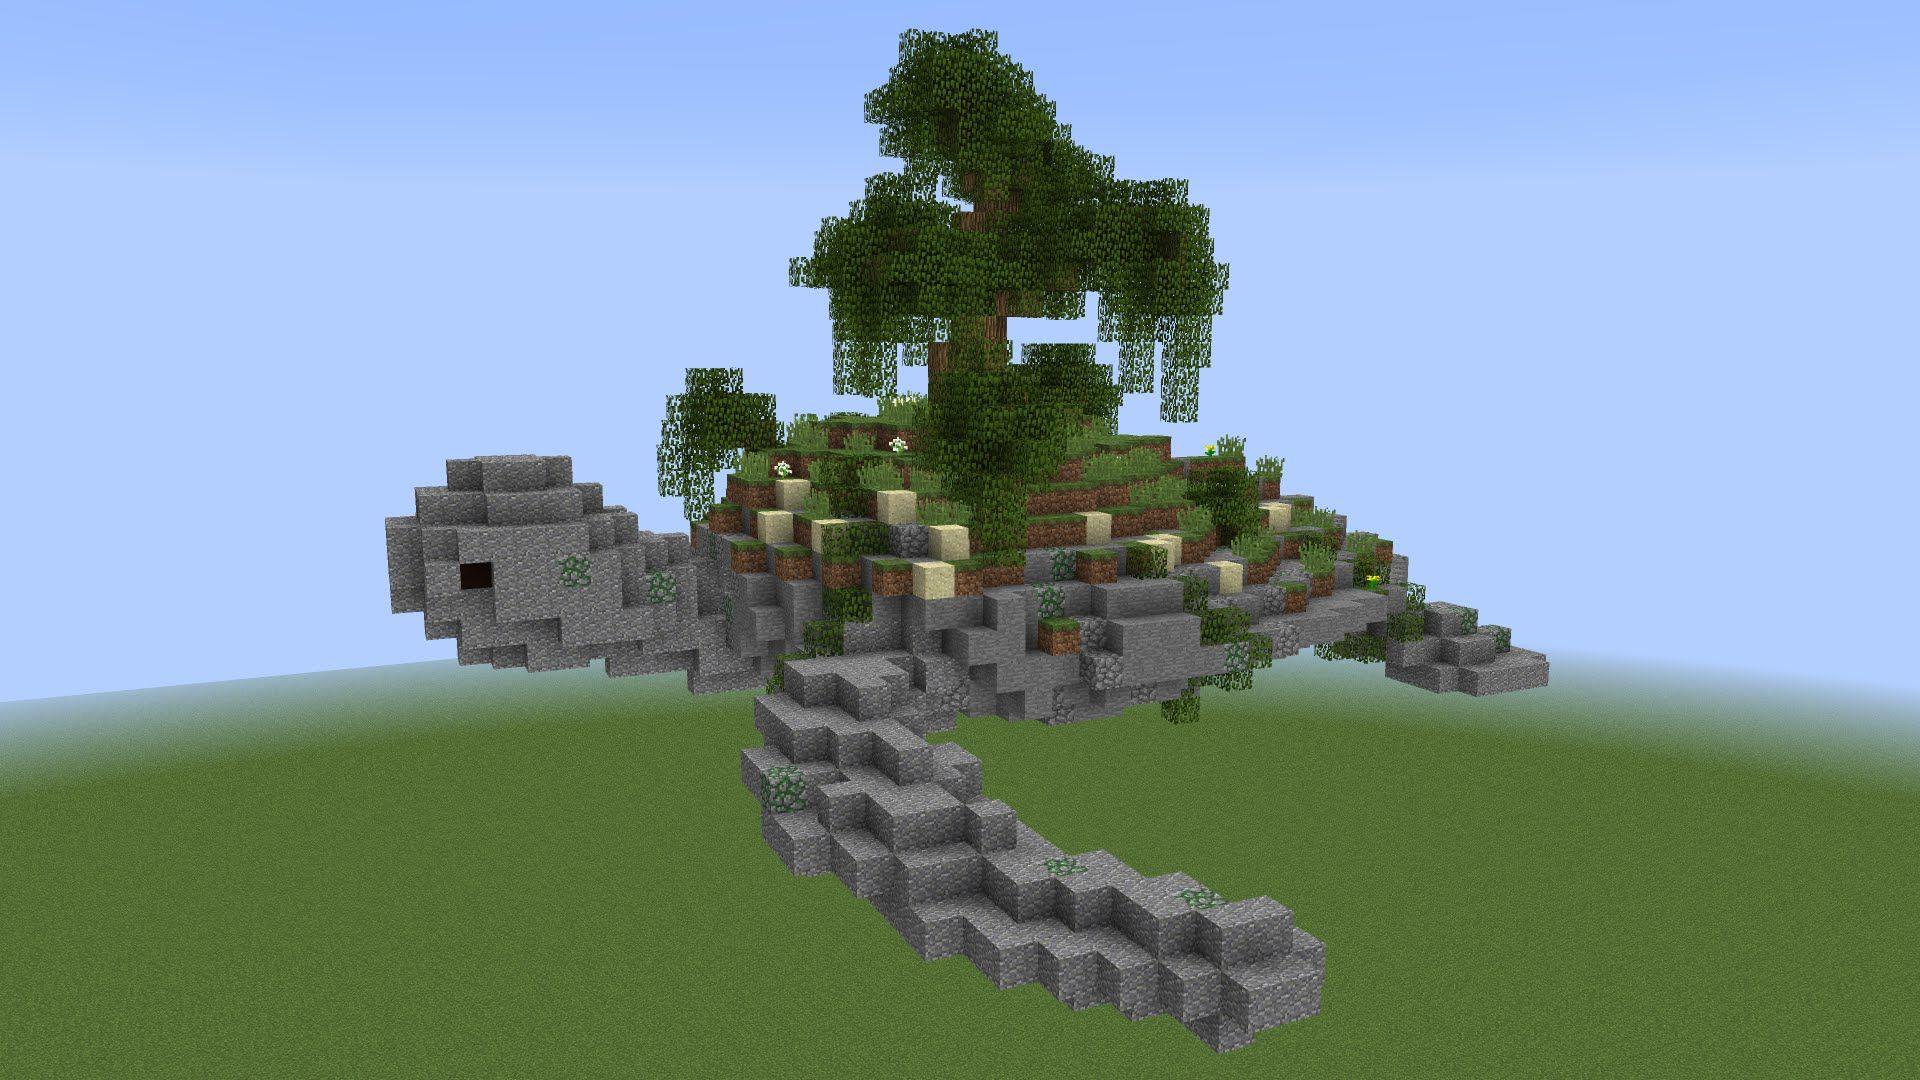 Wacky Builds: Turtle Island! - YouTube  Minecraft blueprints